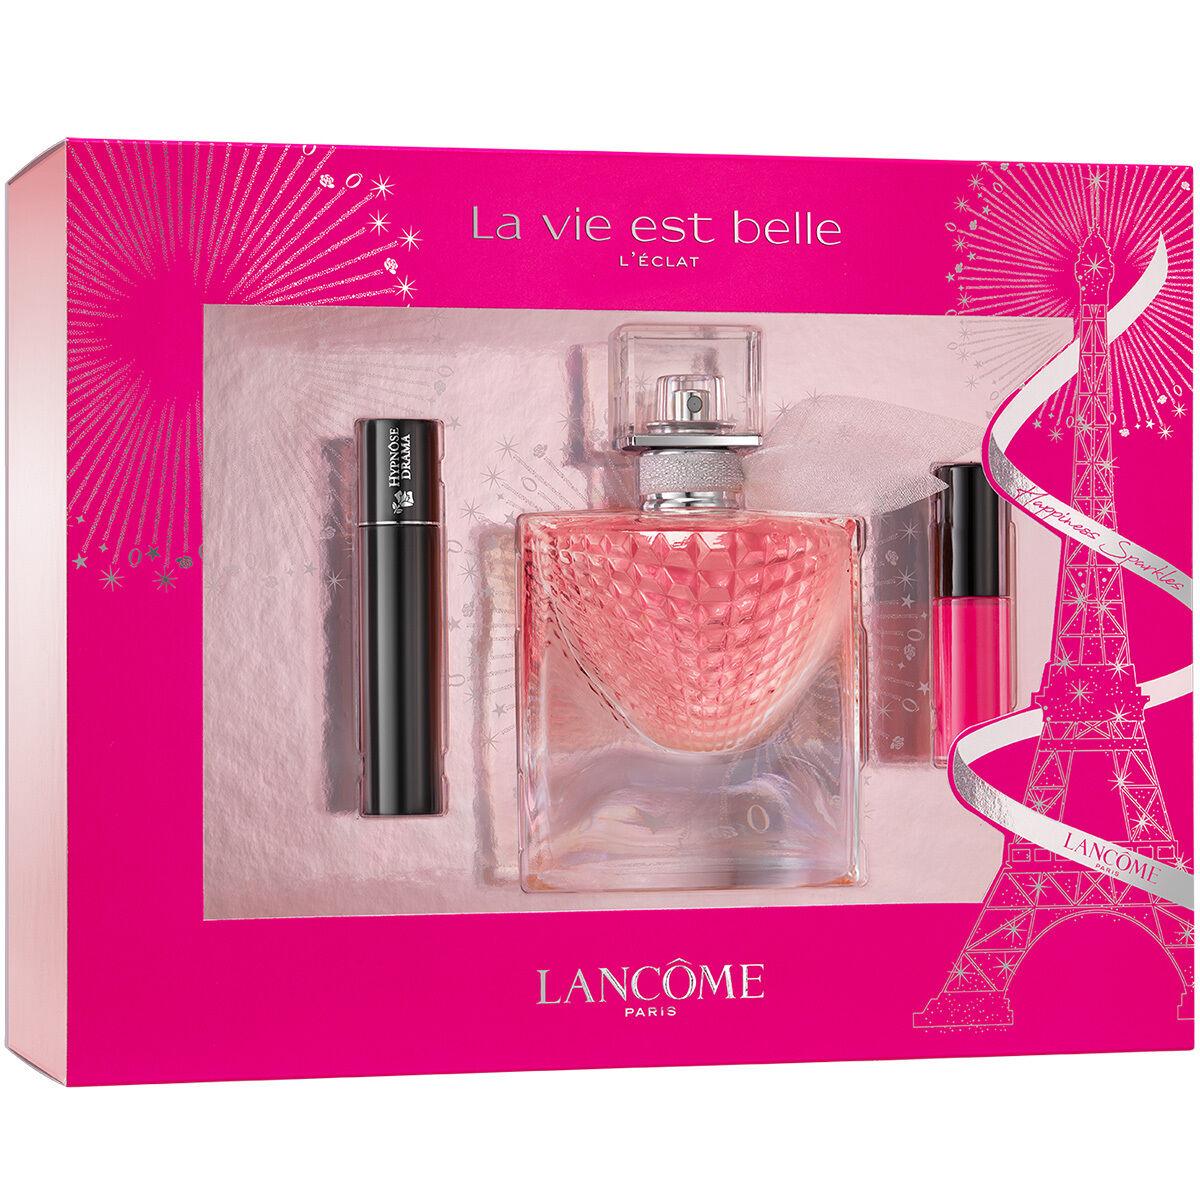 Lancôme - La Vie Est Belle L'Eclat EDP 30 ml + L'Absolu 378 Lip Color + Hypnose Mascara 2 ml - Giftset